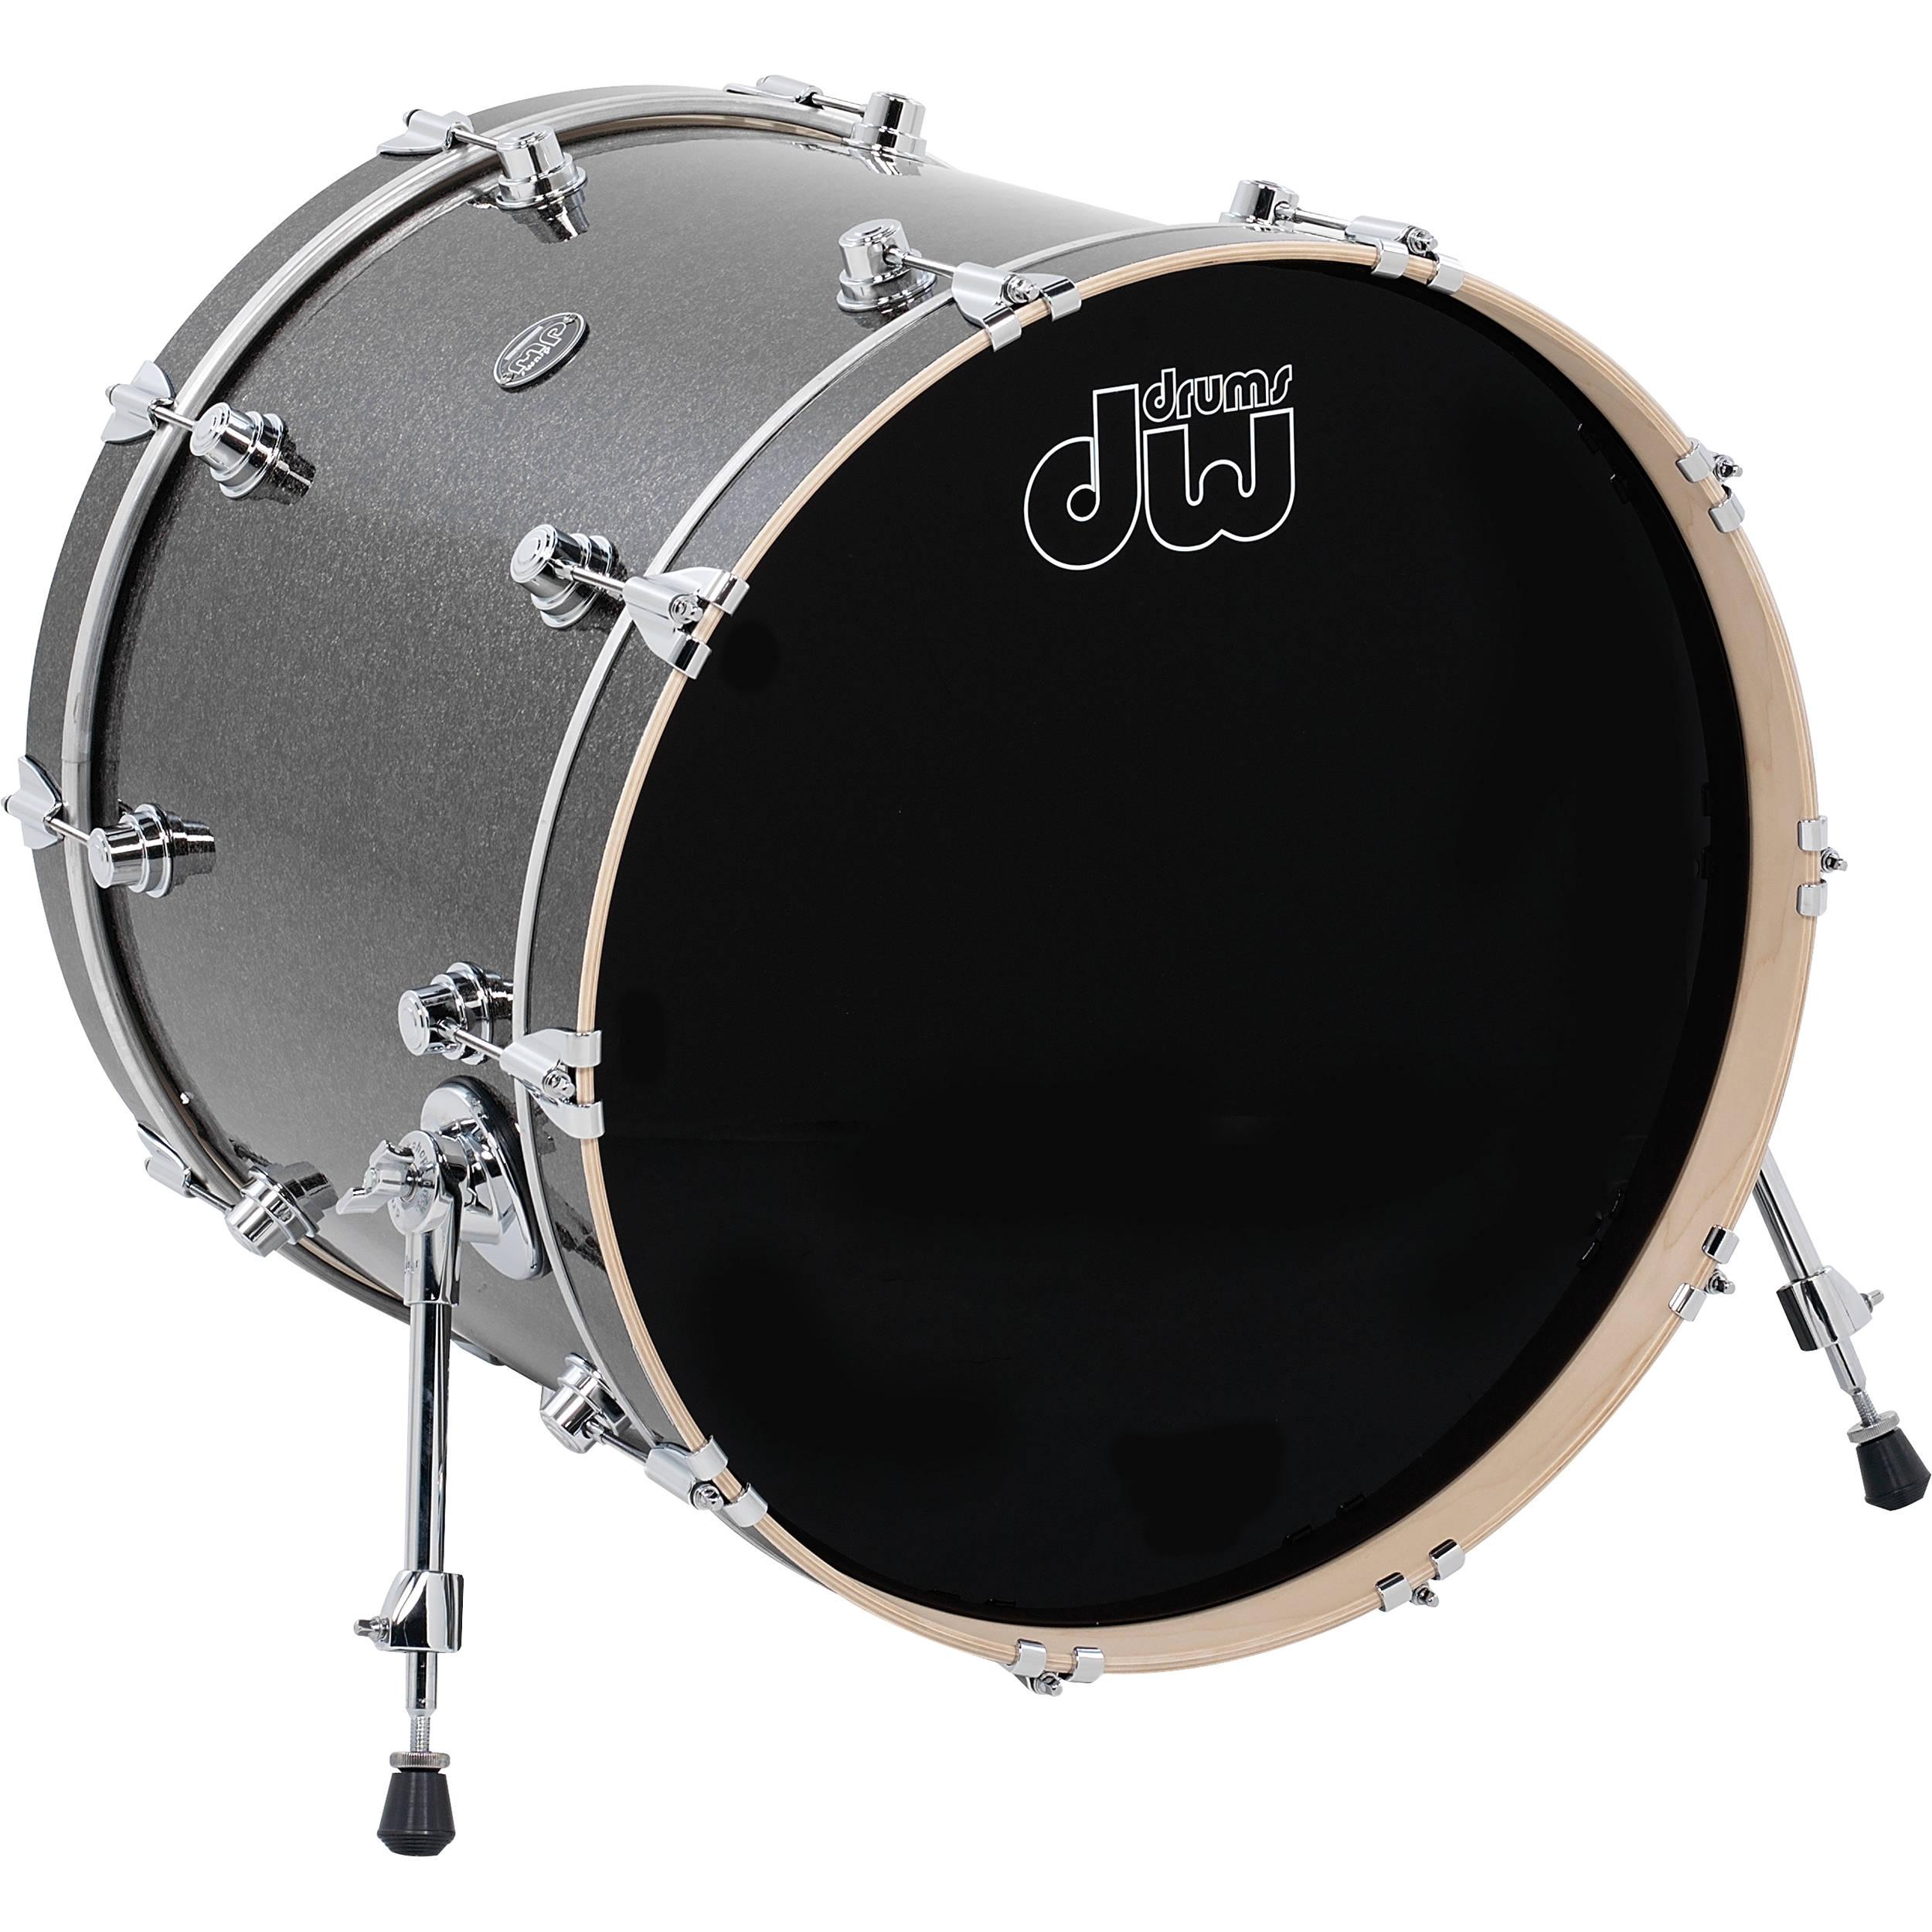 dw drums performance series 18 x 22 kick drpf1822kkps. Black Bedroom Furniture Sets. Home Design Ideas